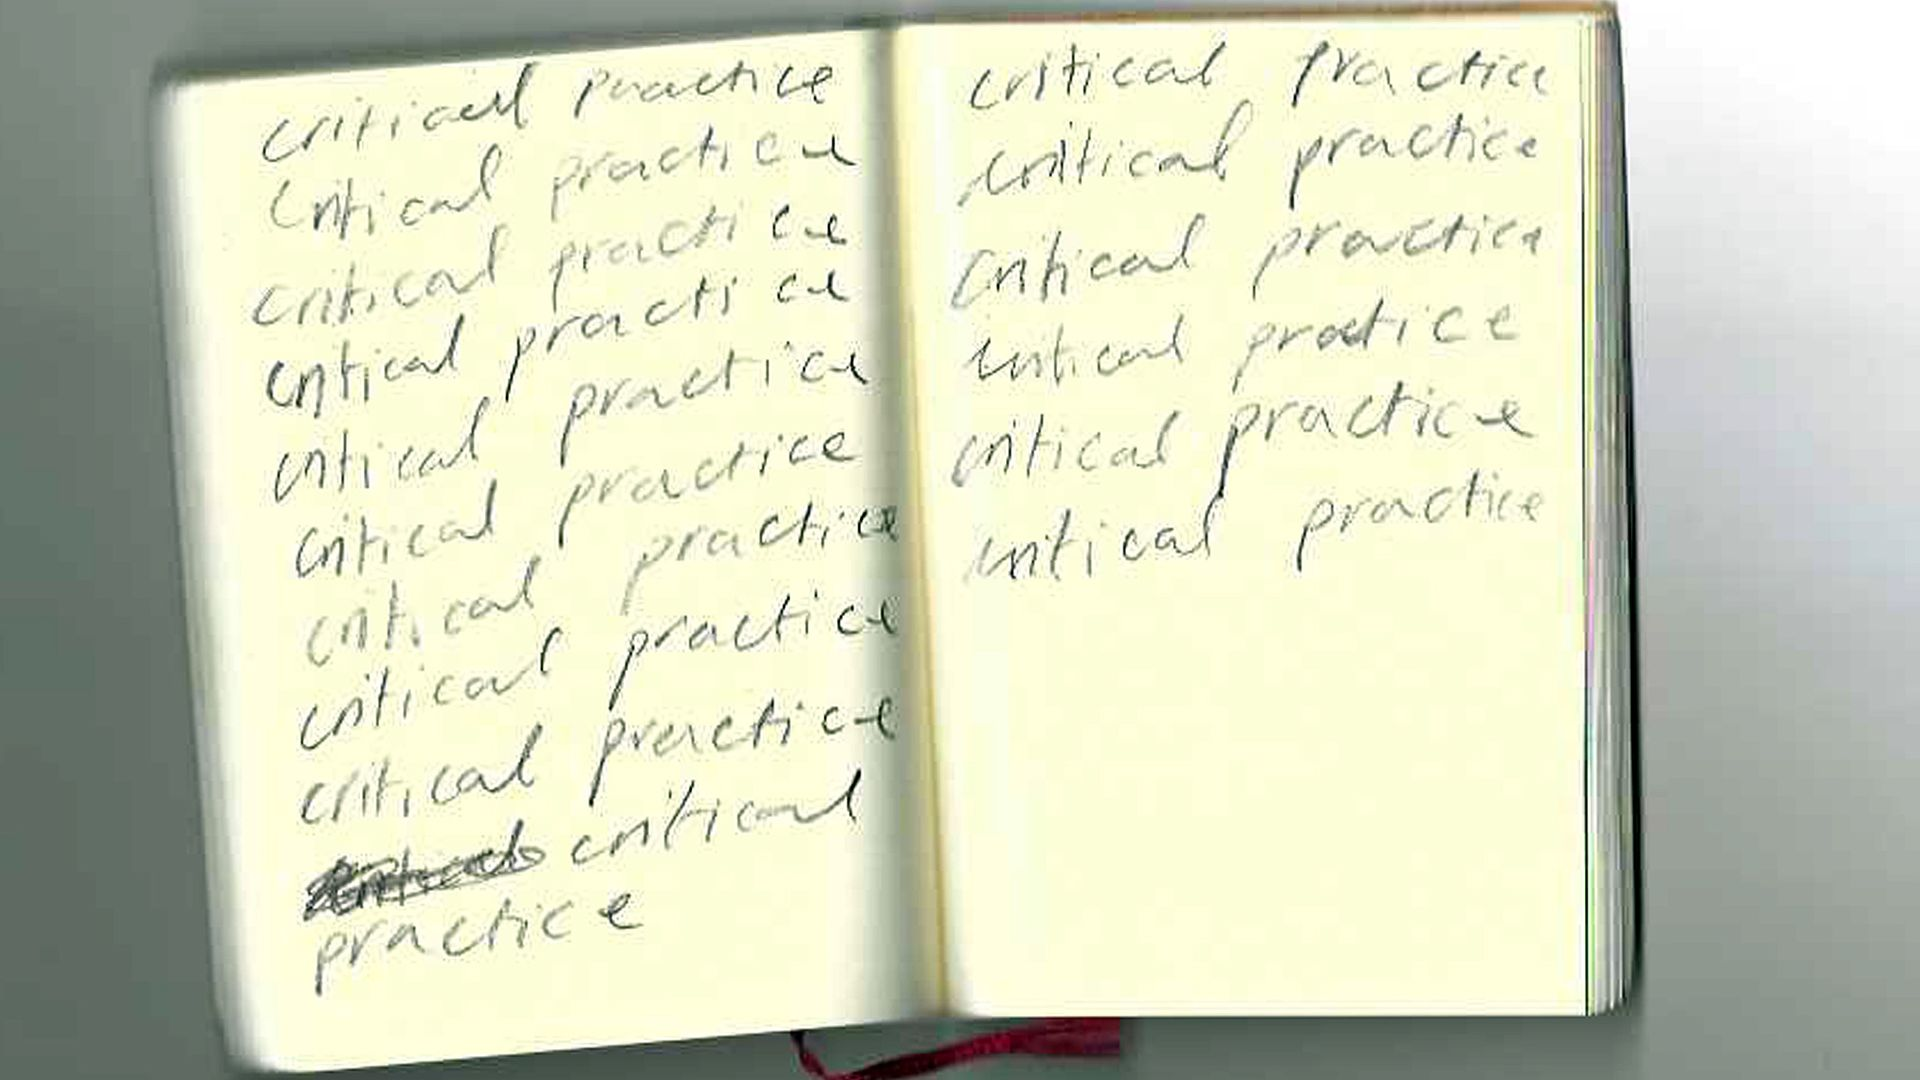 CAP Critical Practice open book